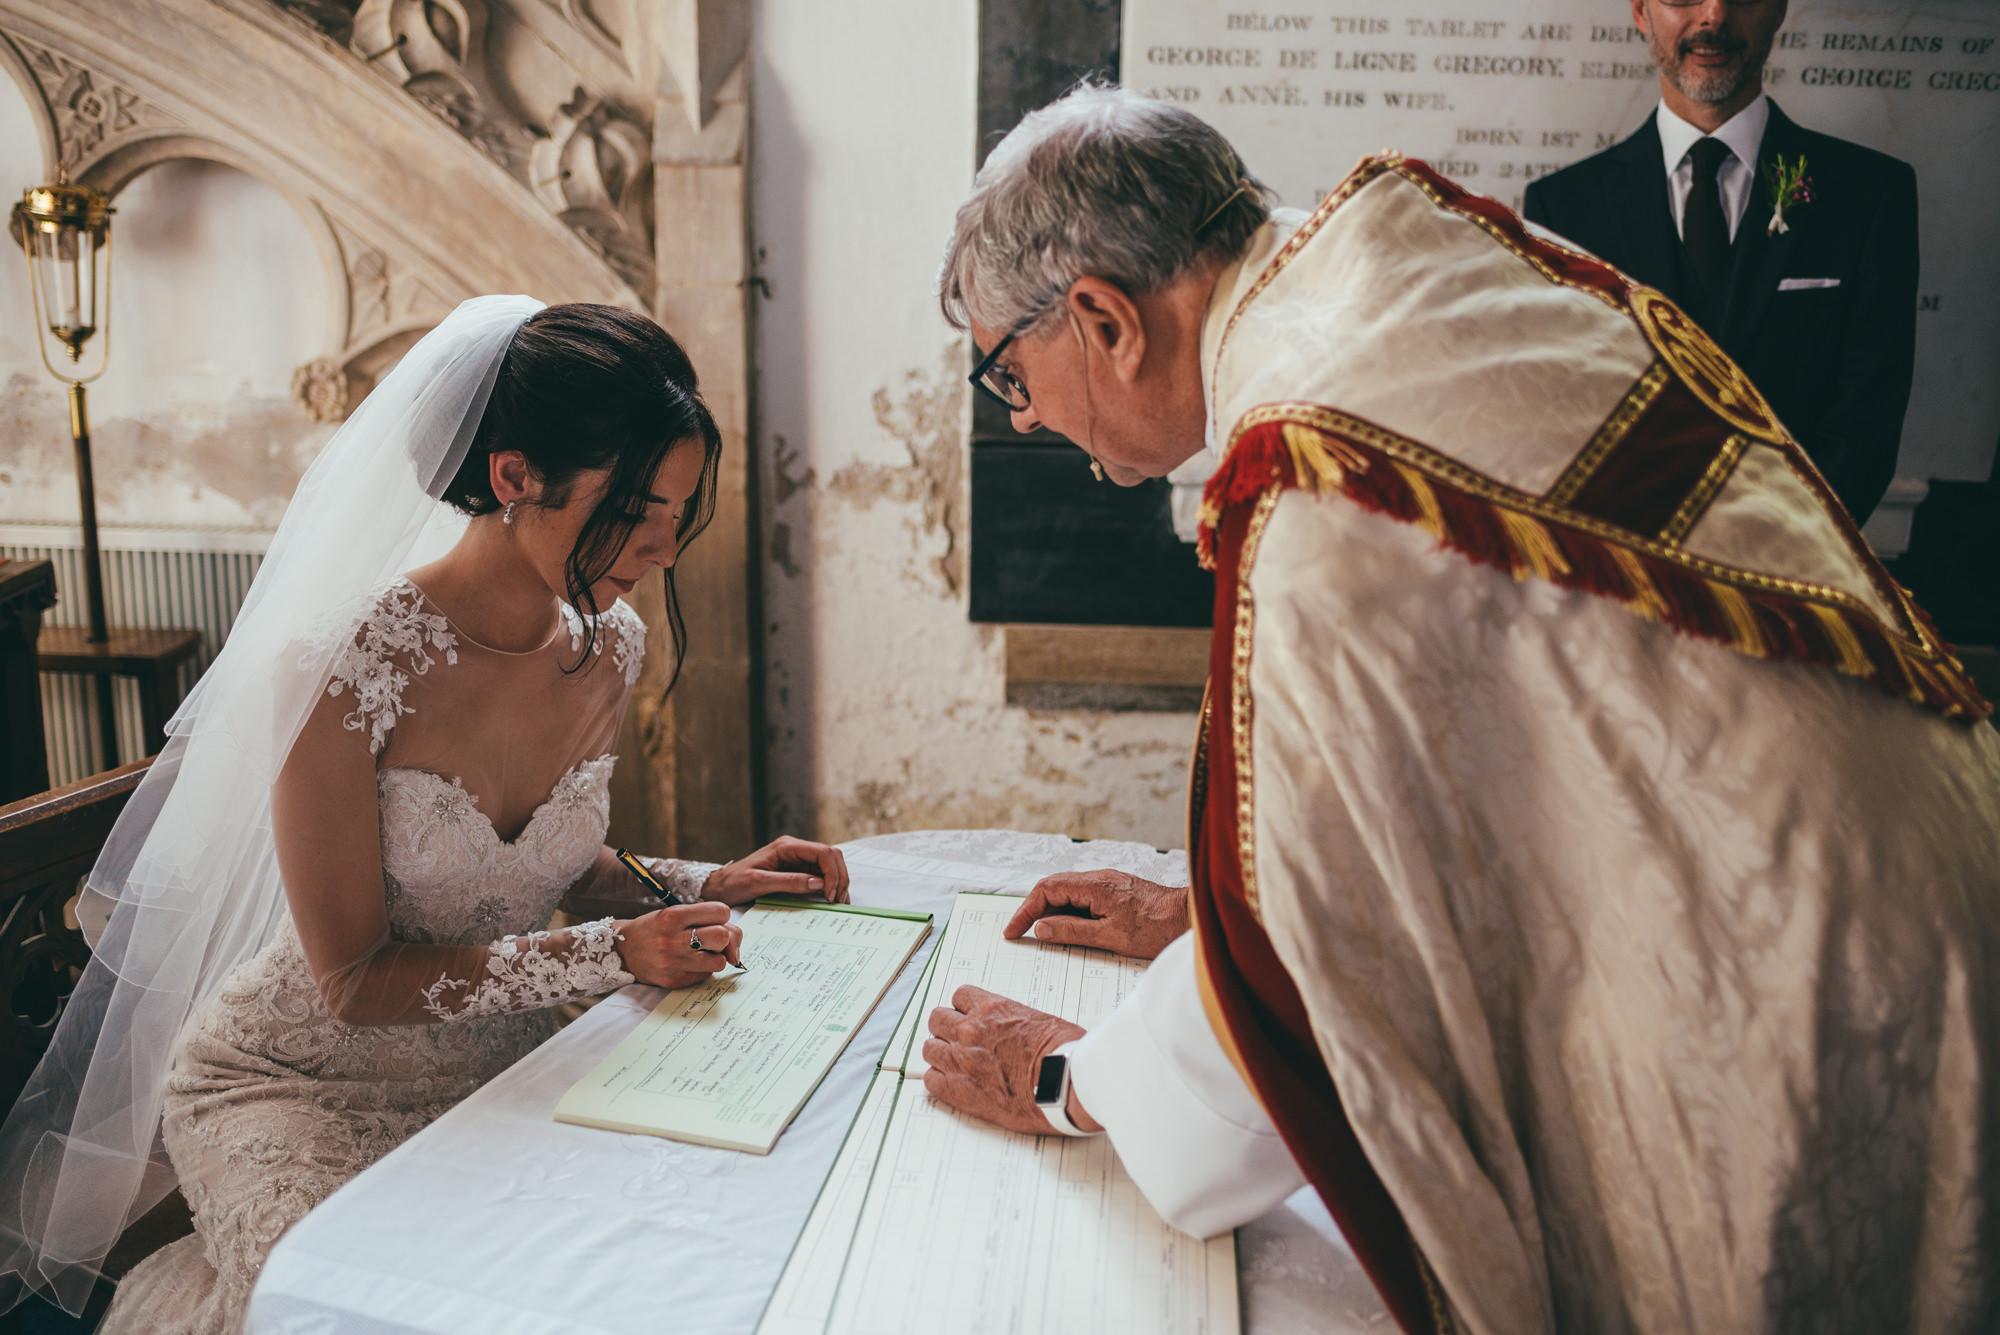 bride signing the wedding register